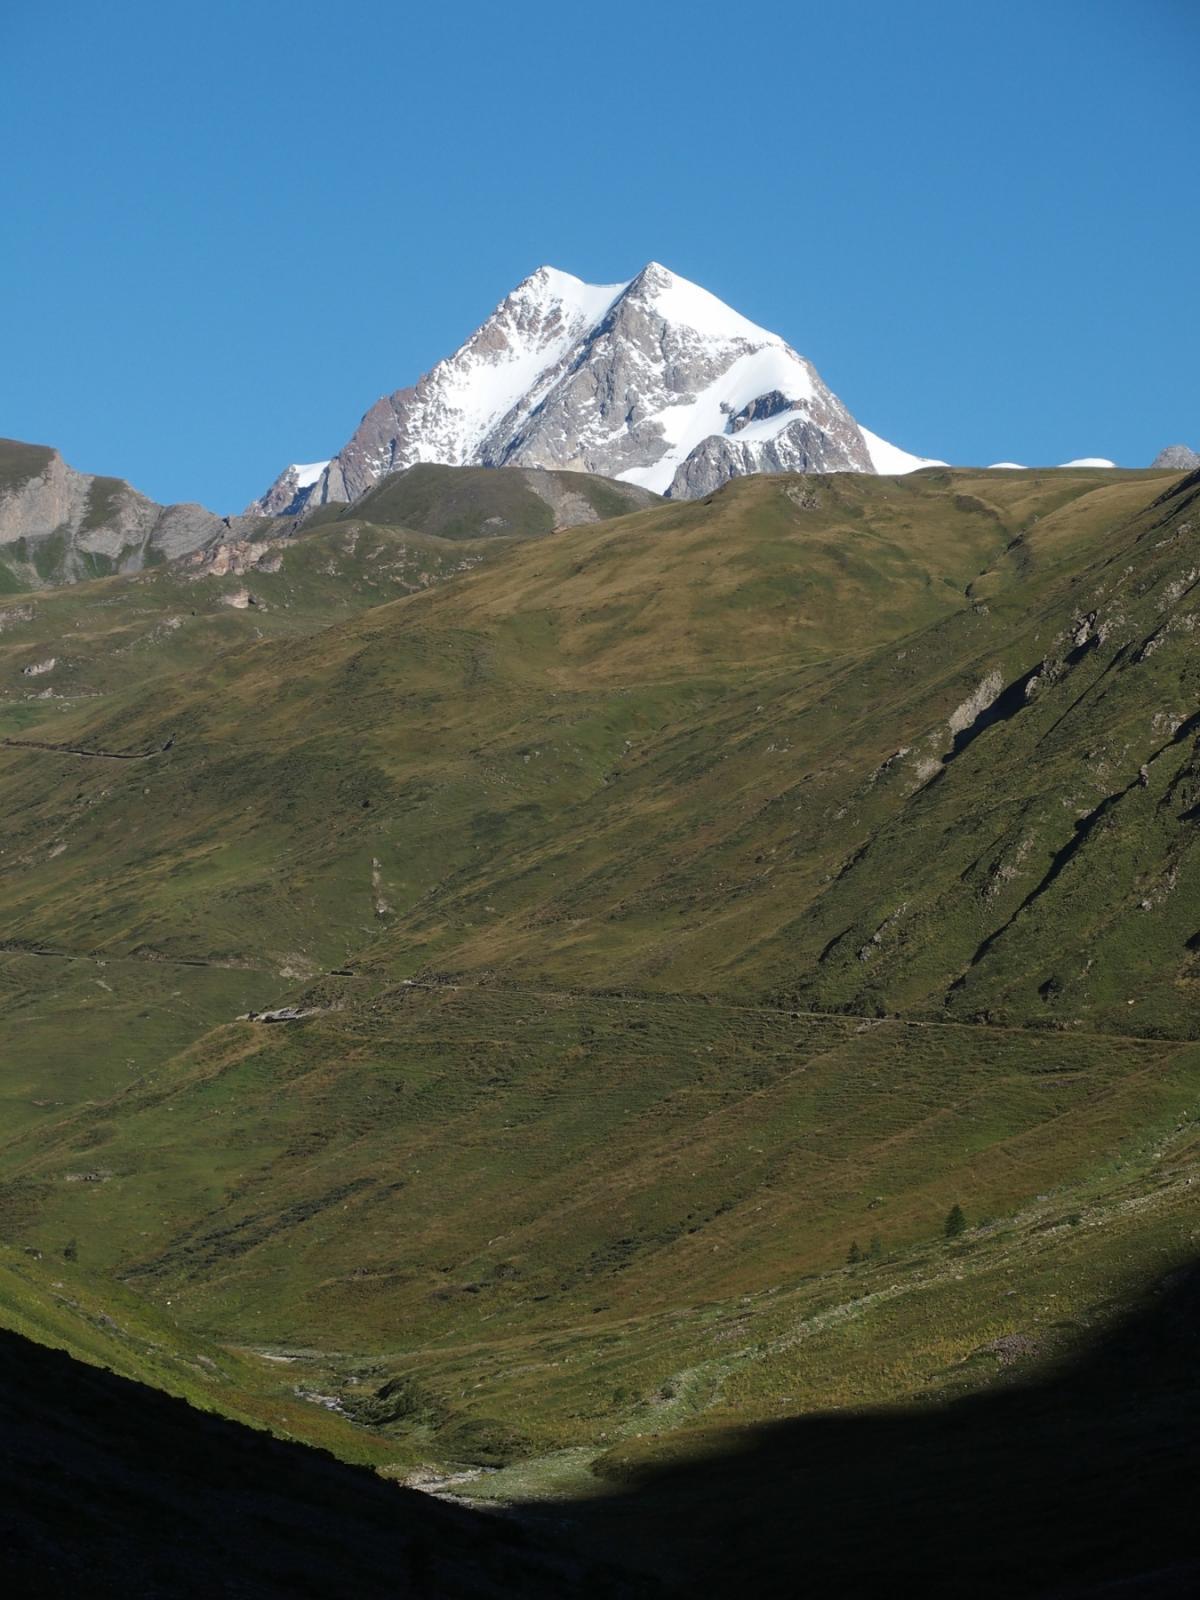 Salendo nel vallone le Aiguilles de Trélatète sbucano come un colosso Himalayano!